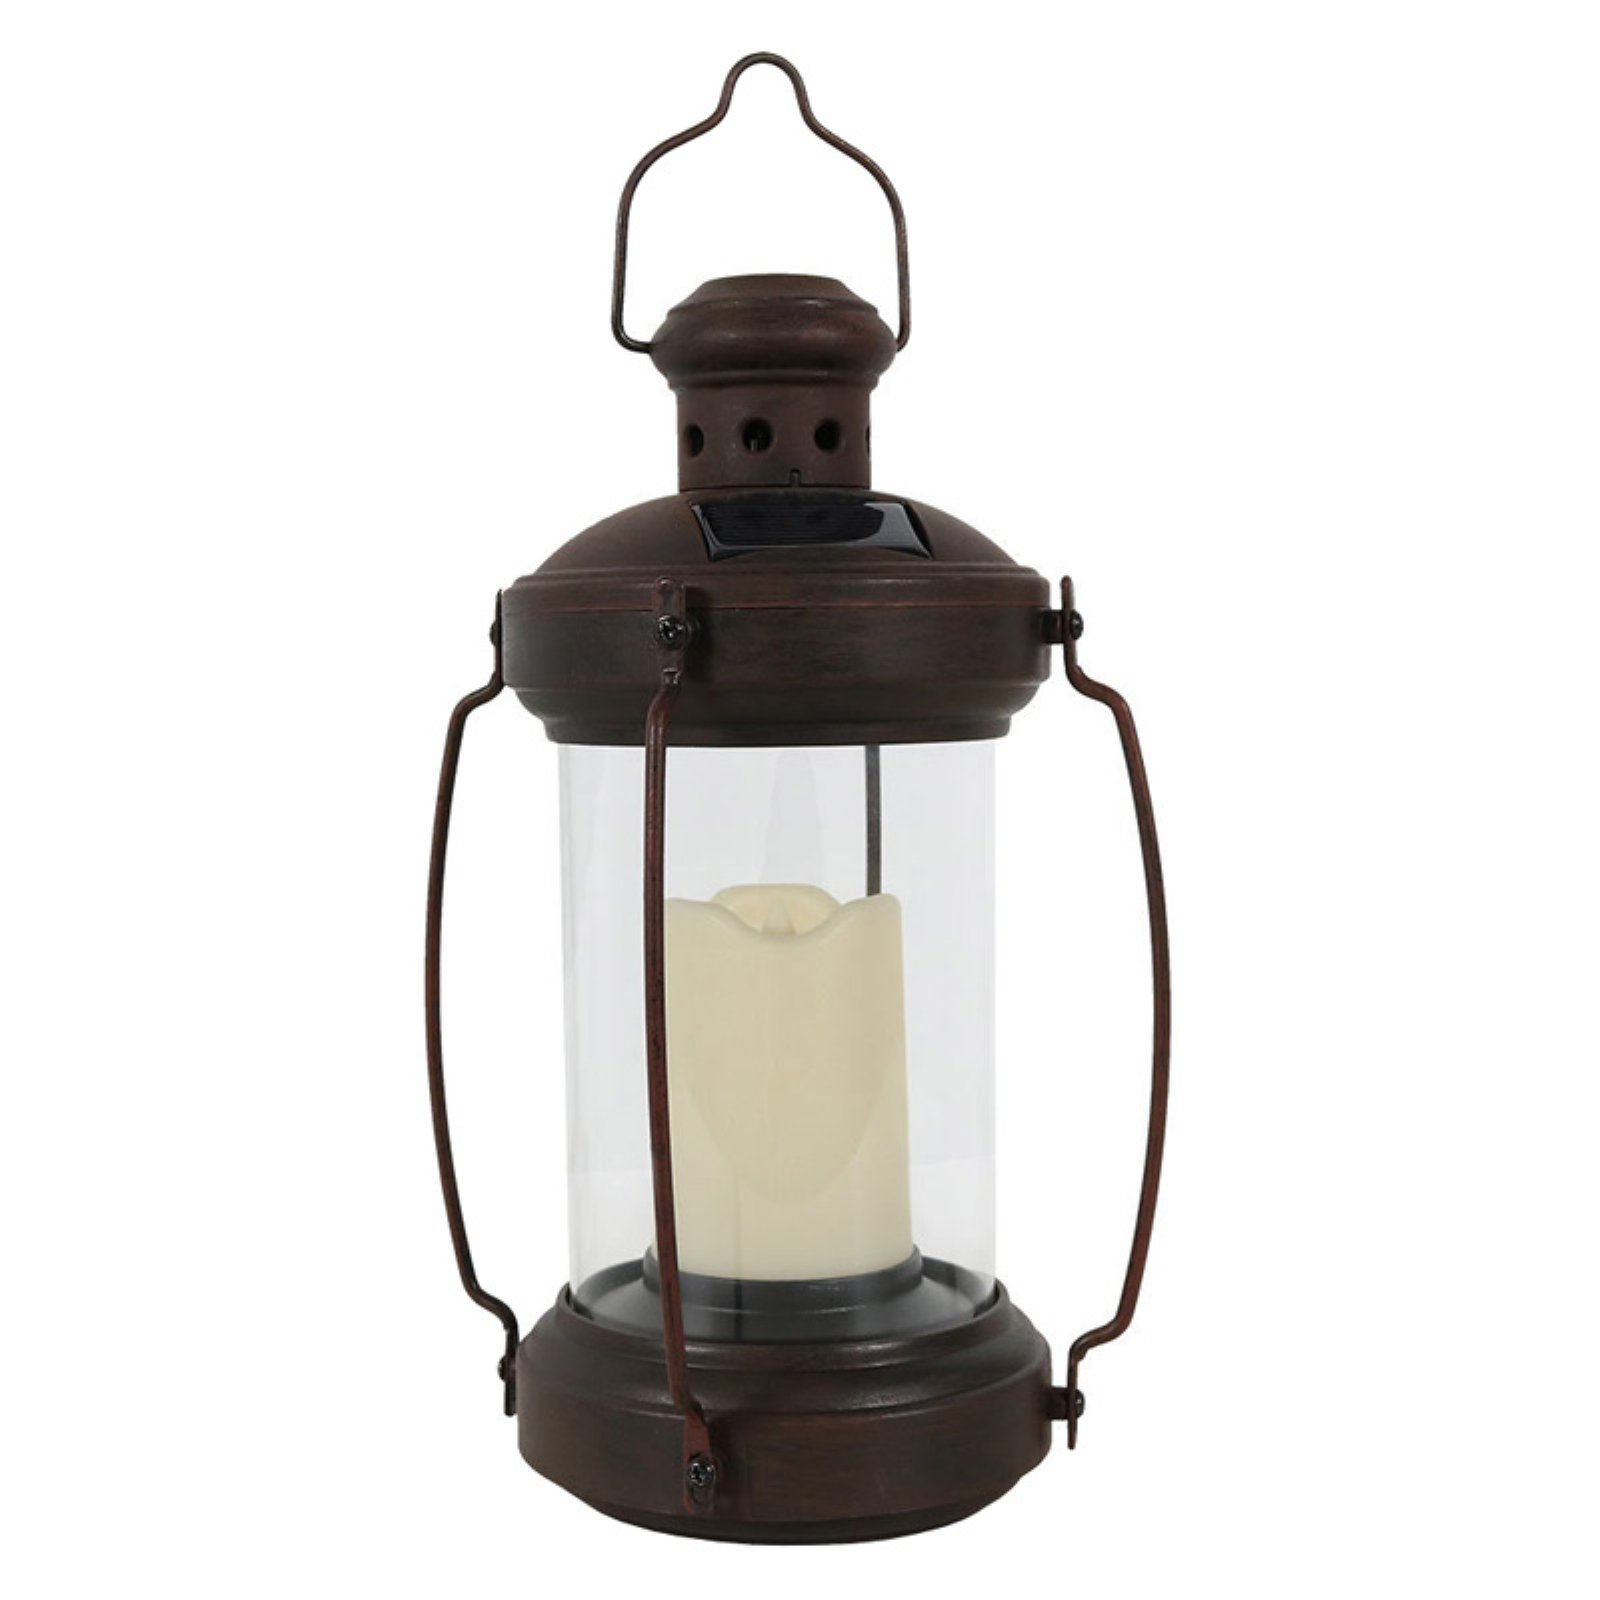 Sunnydaze Decor Solar Antique Hanging Lantern with Candle and LED Light